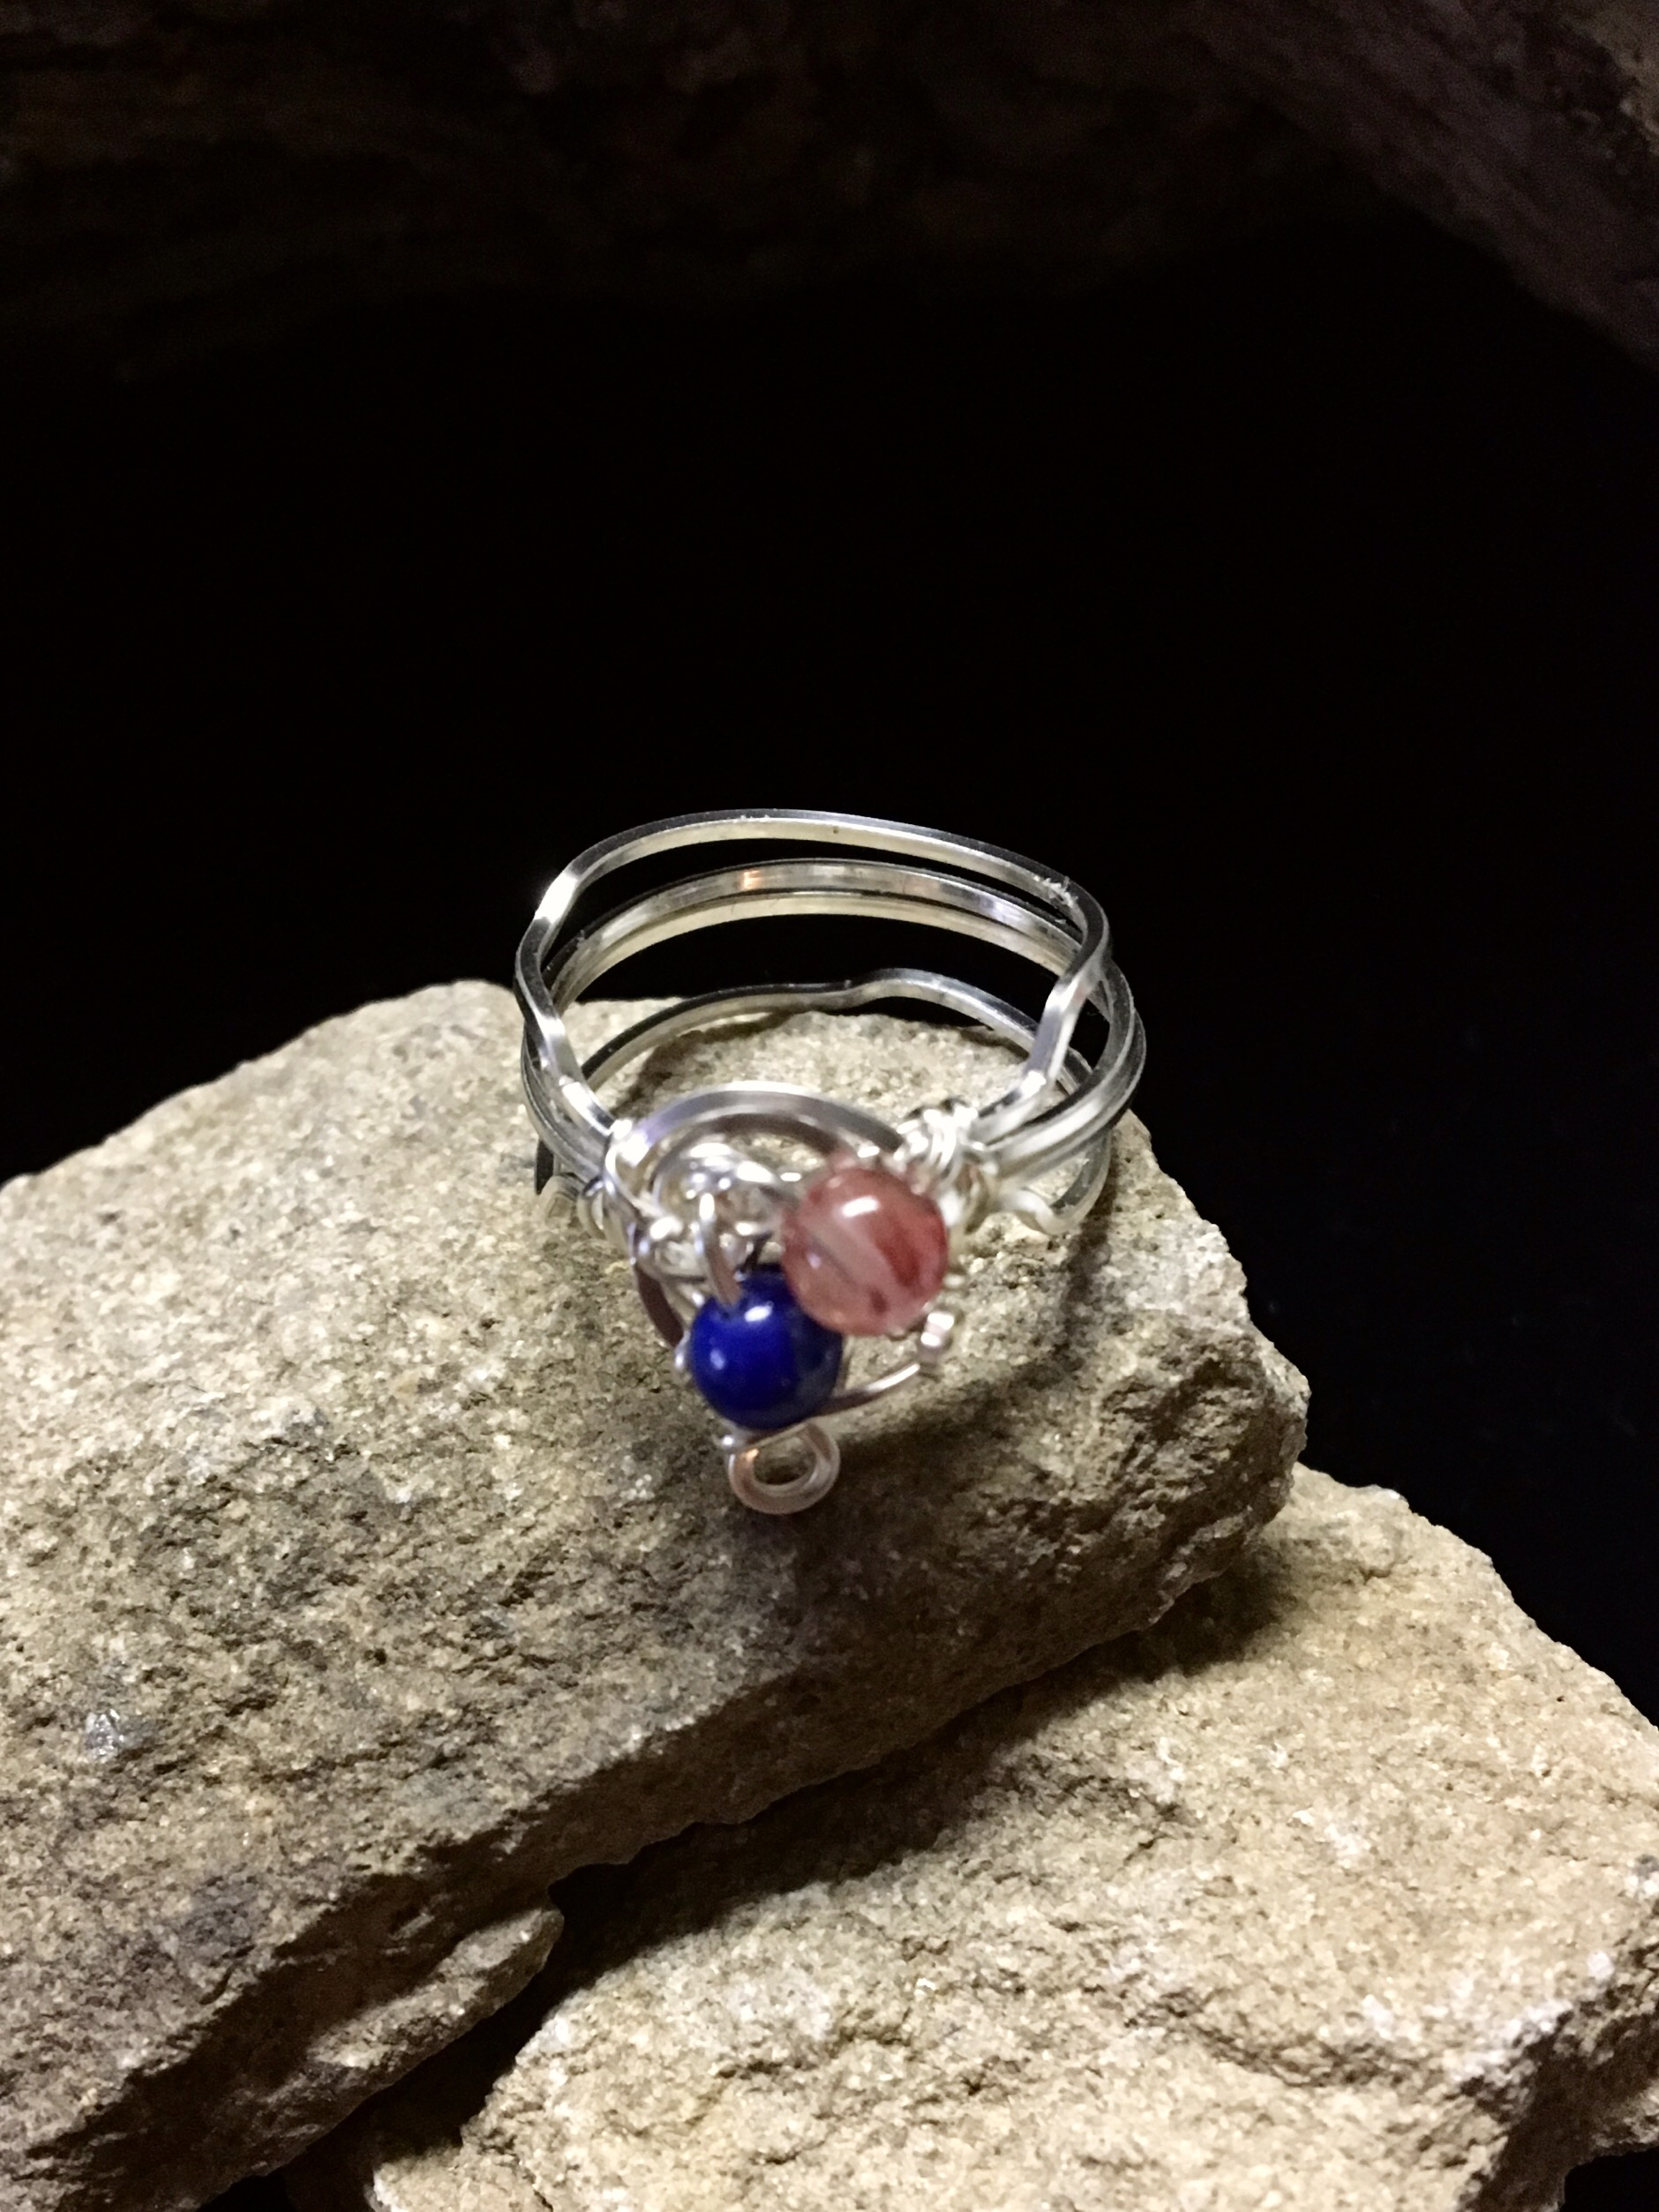 Qhresnna Quartz Ring - Lapis Lazuli and Agathe - Silver Plated